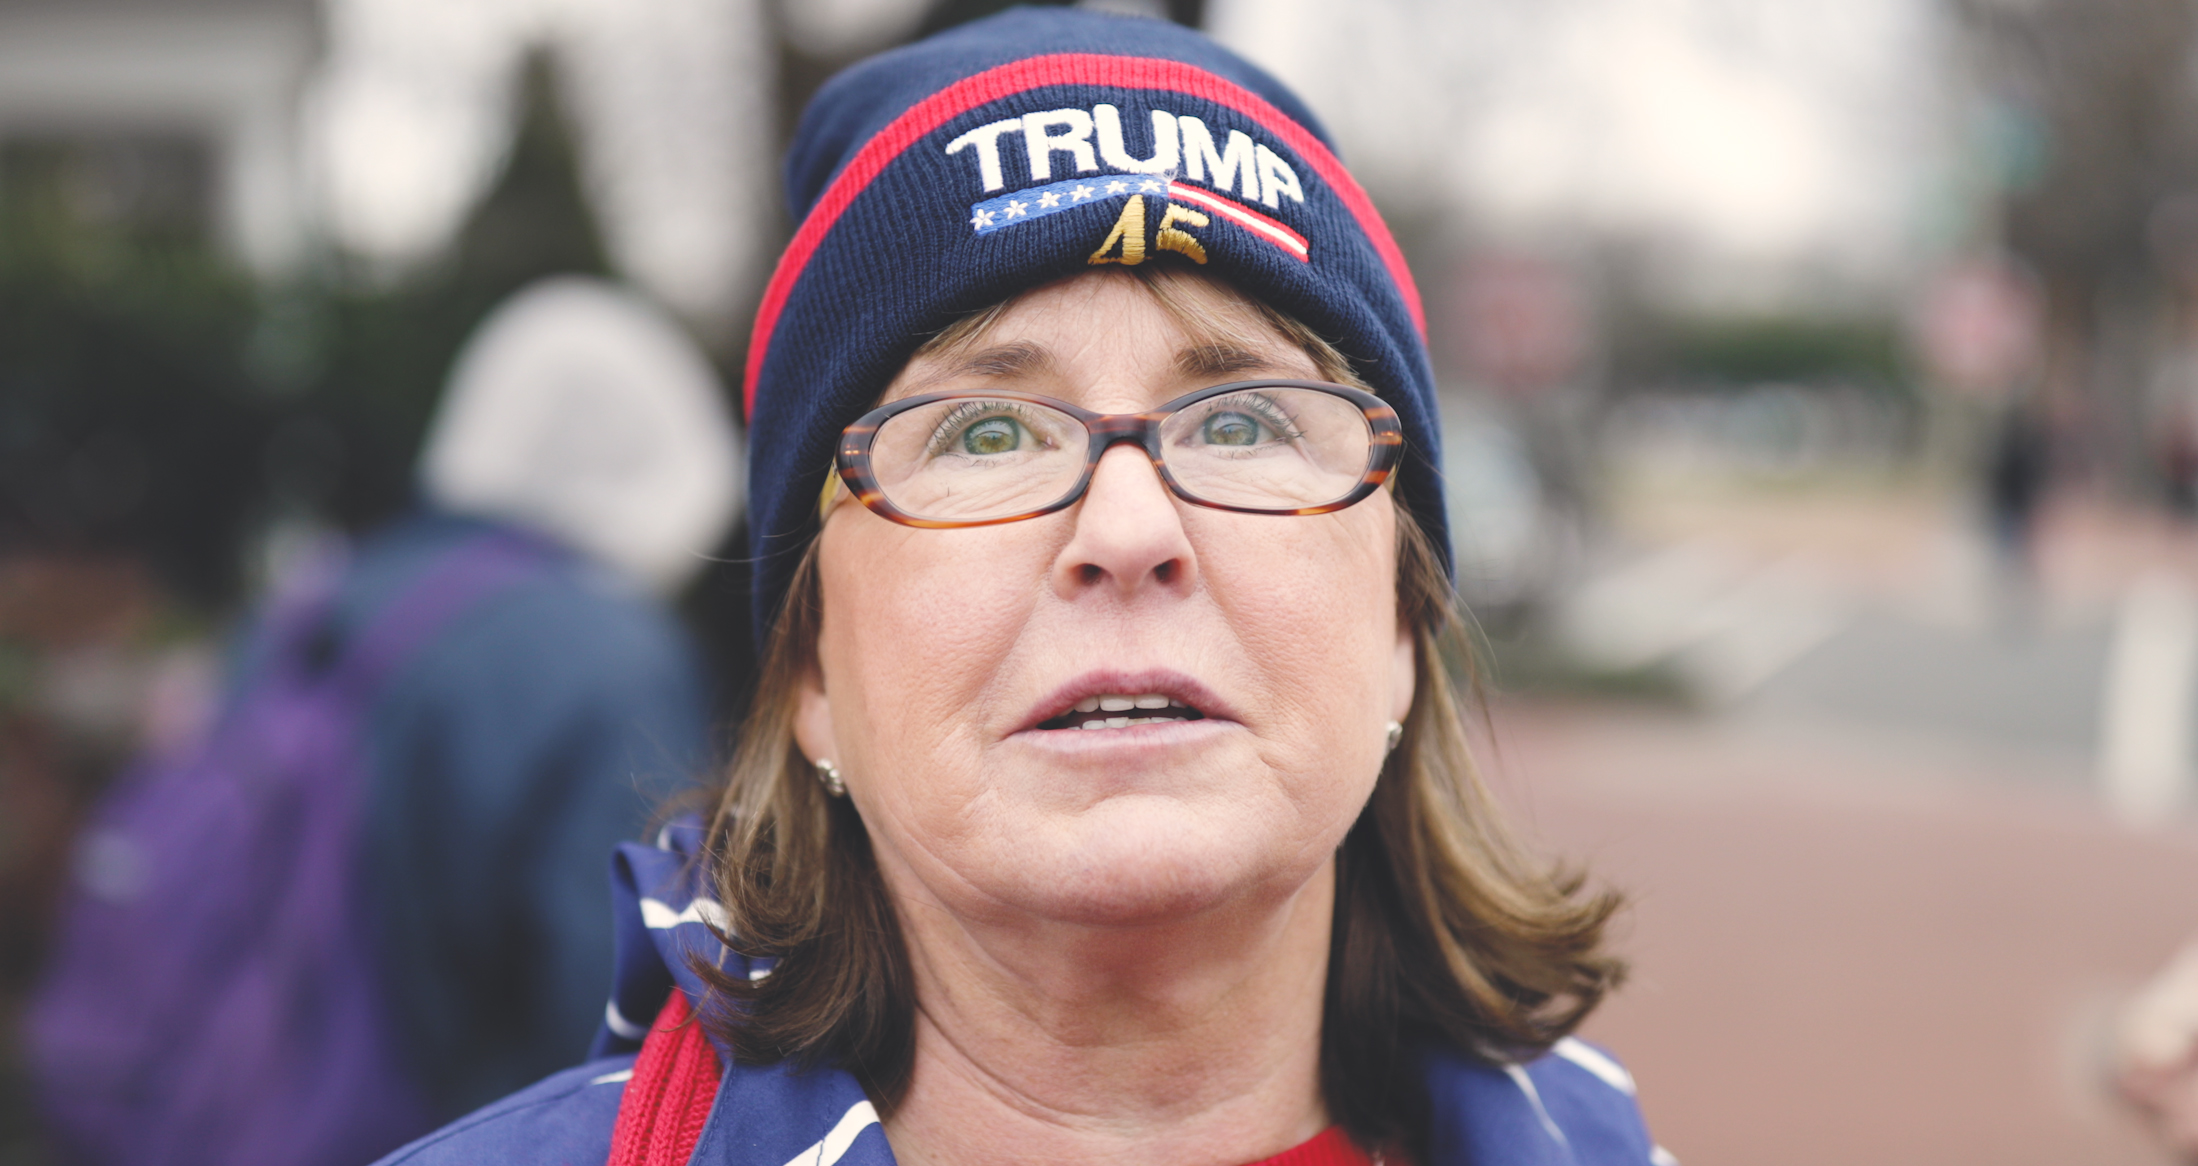 Trump supporter lady.jpg